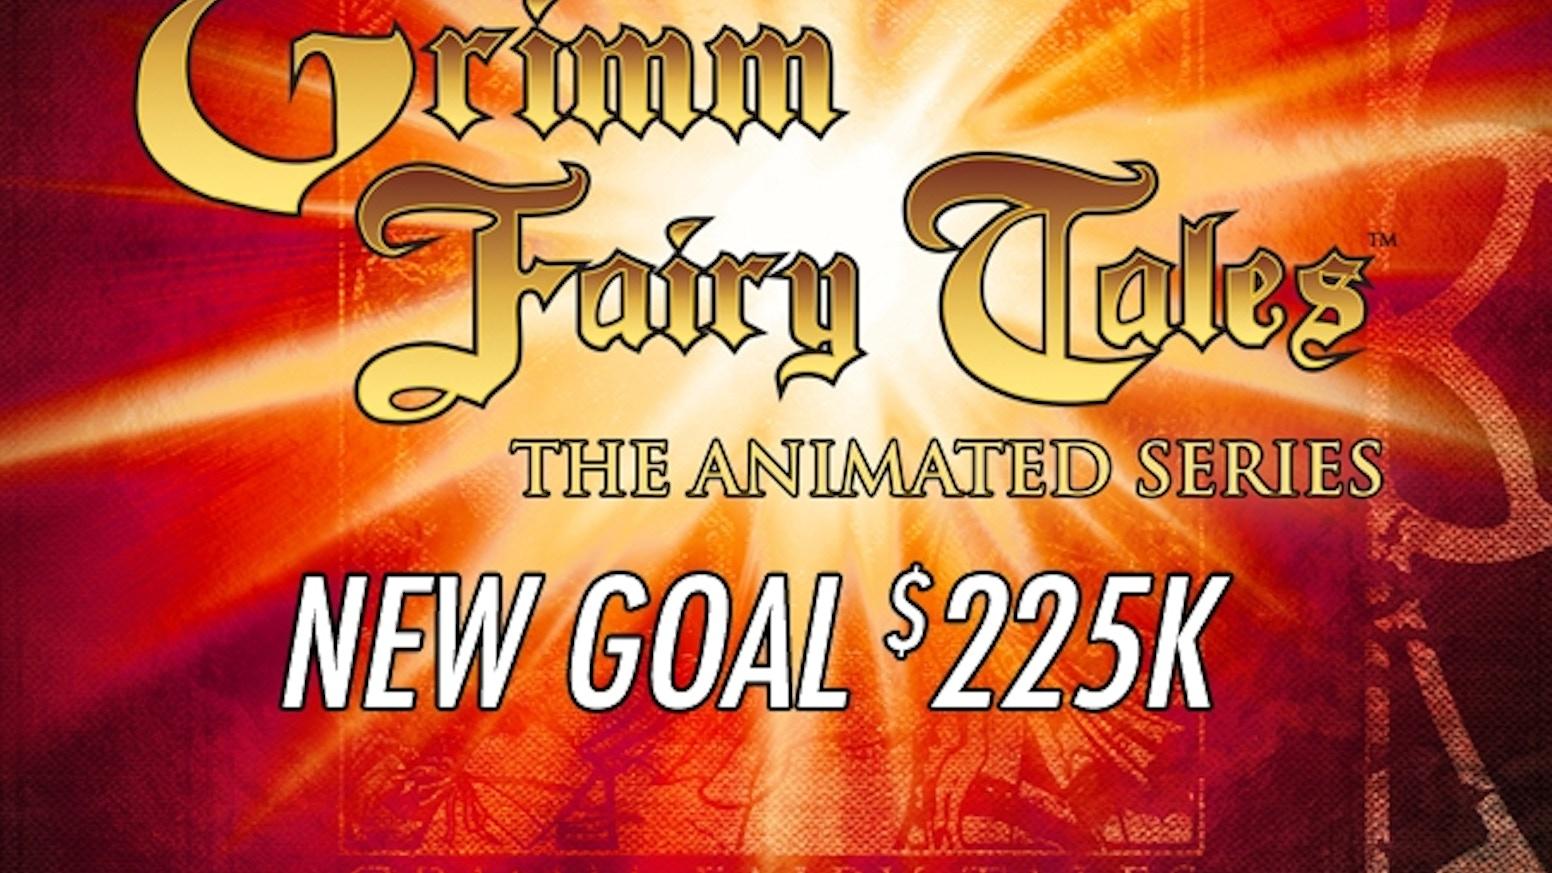 Grimm Fairy Tales Animated Series ( Zenescope ) by Joe